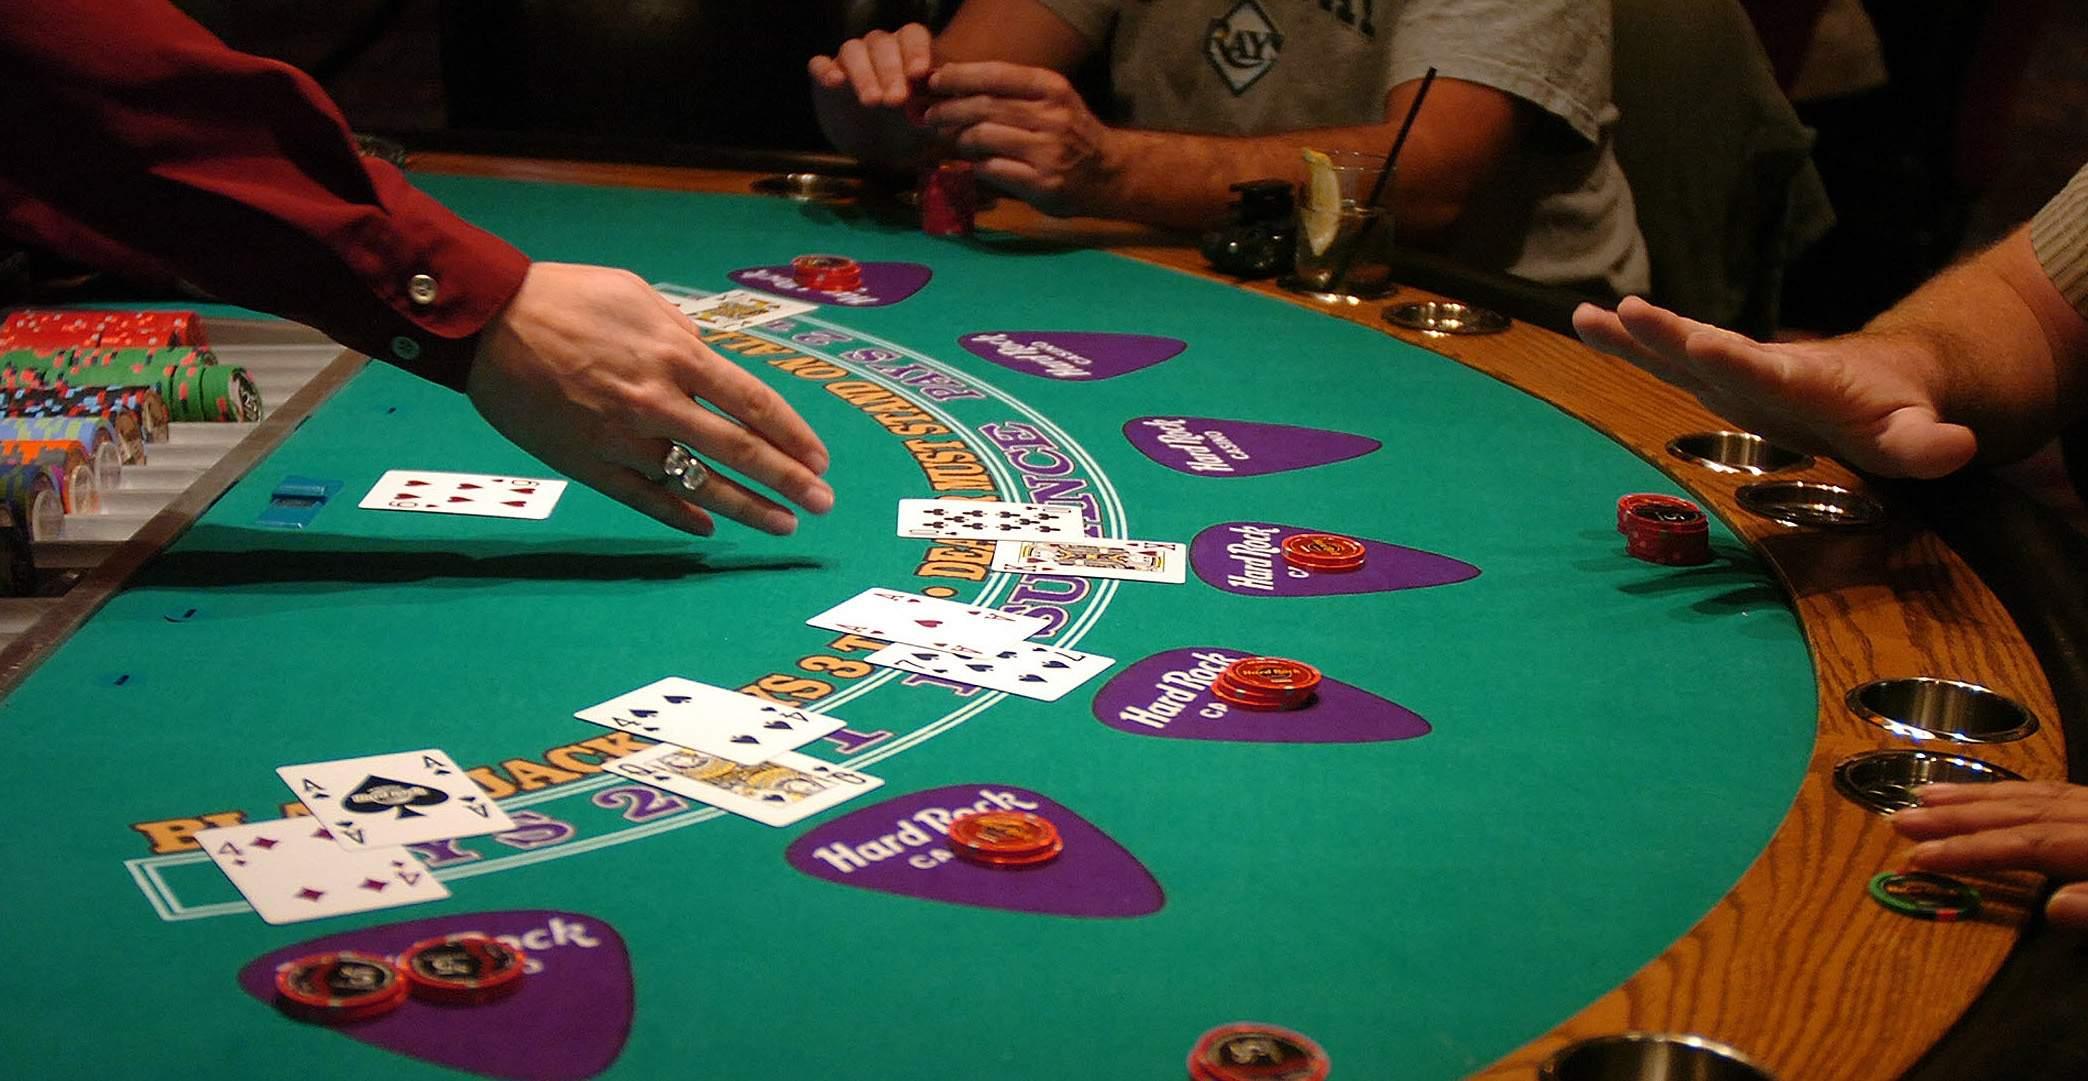 Apprendre à compter au blackjack